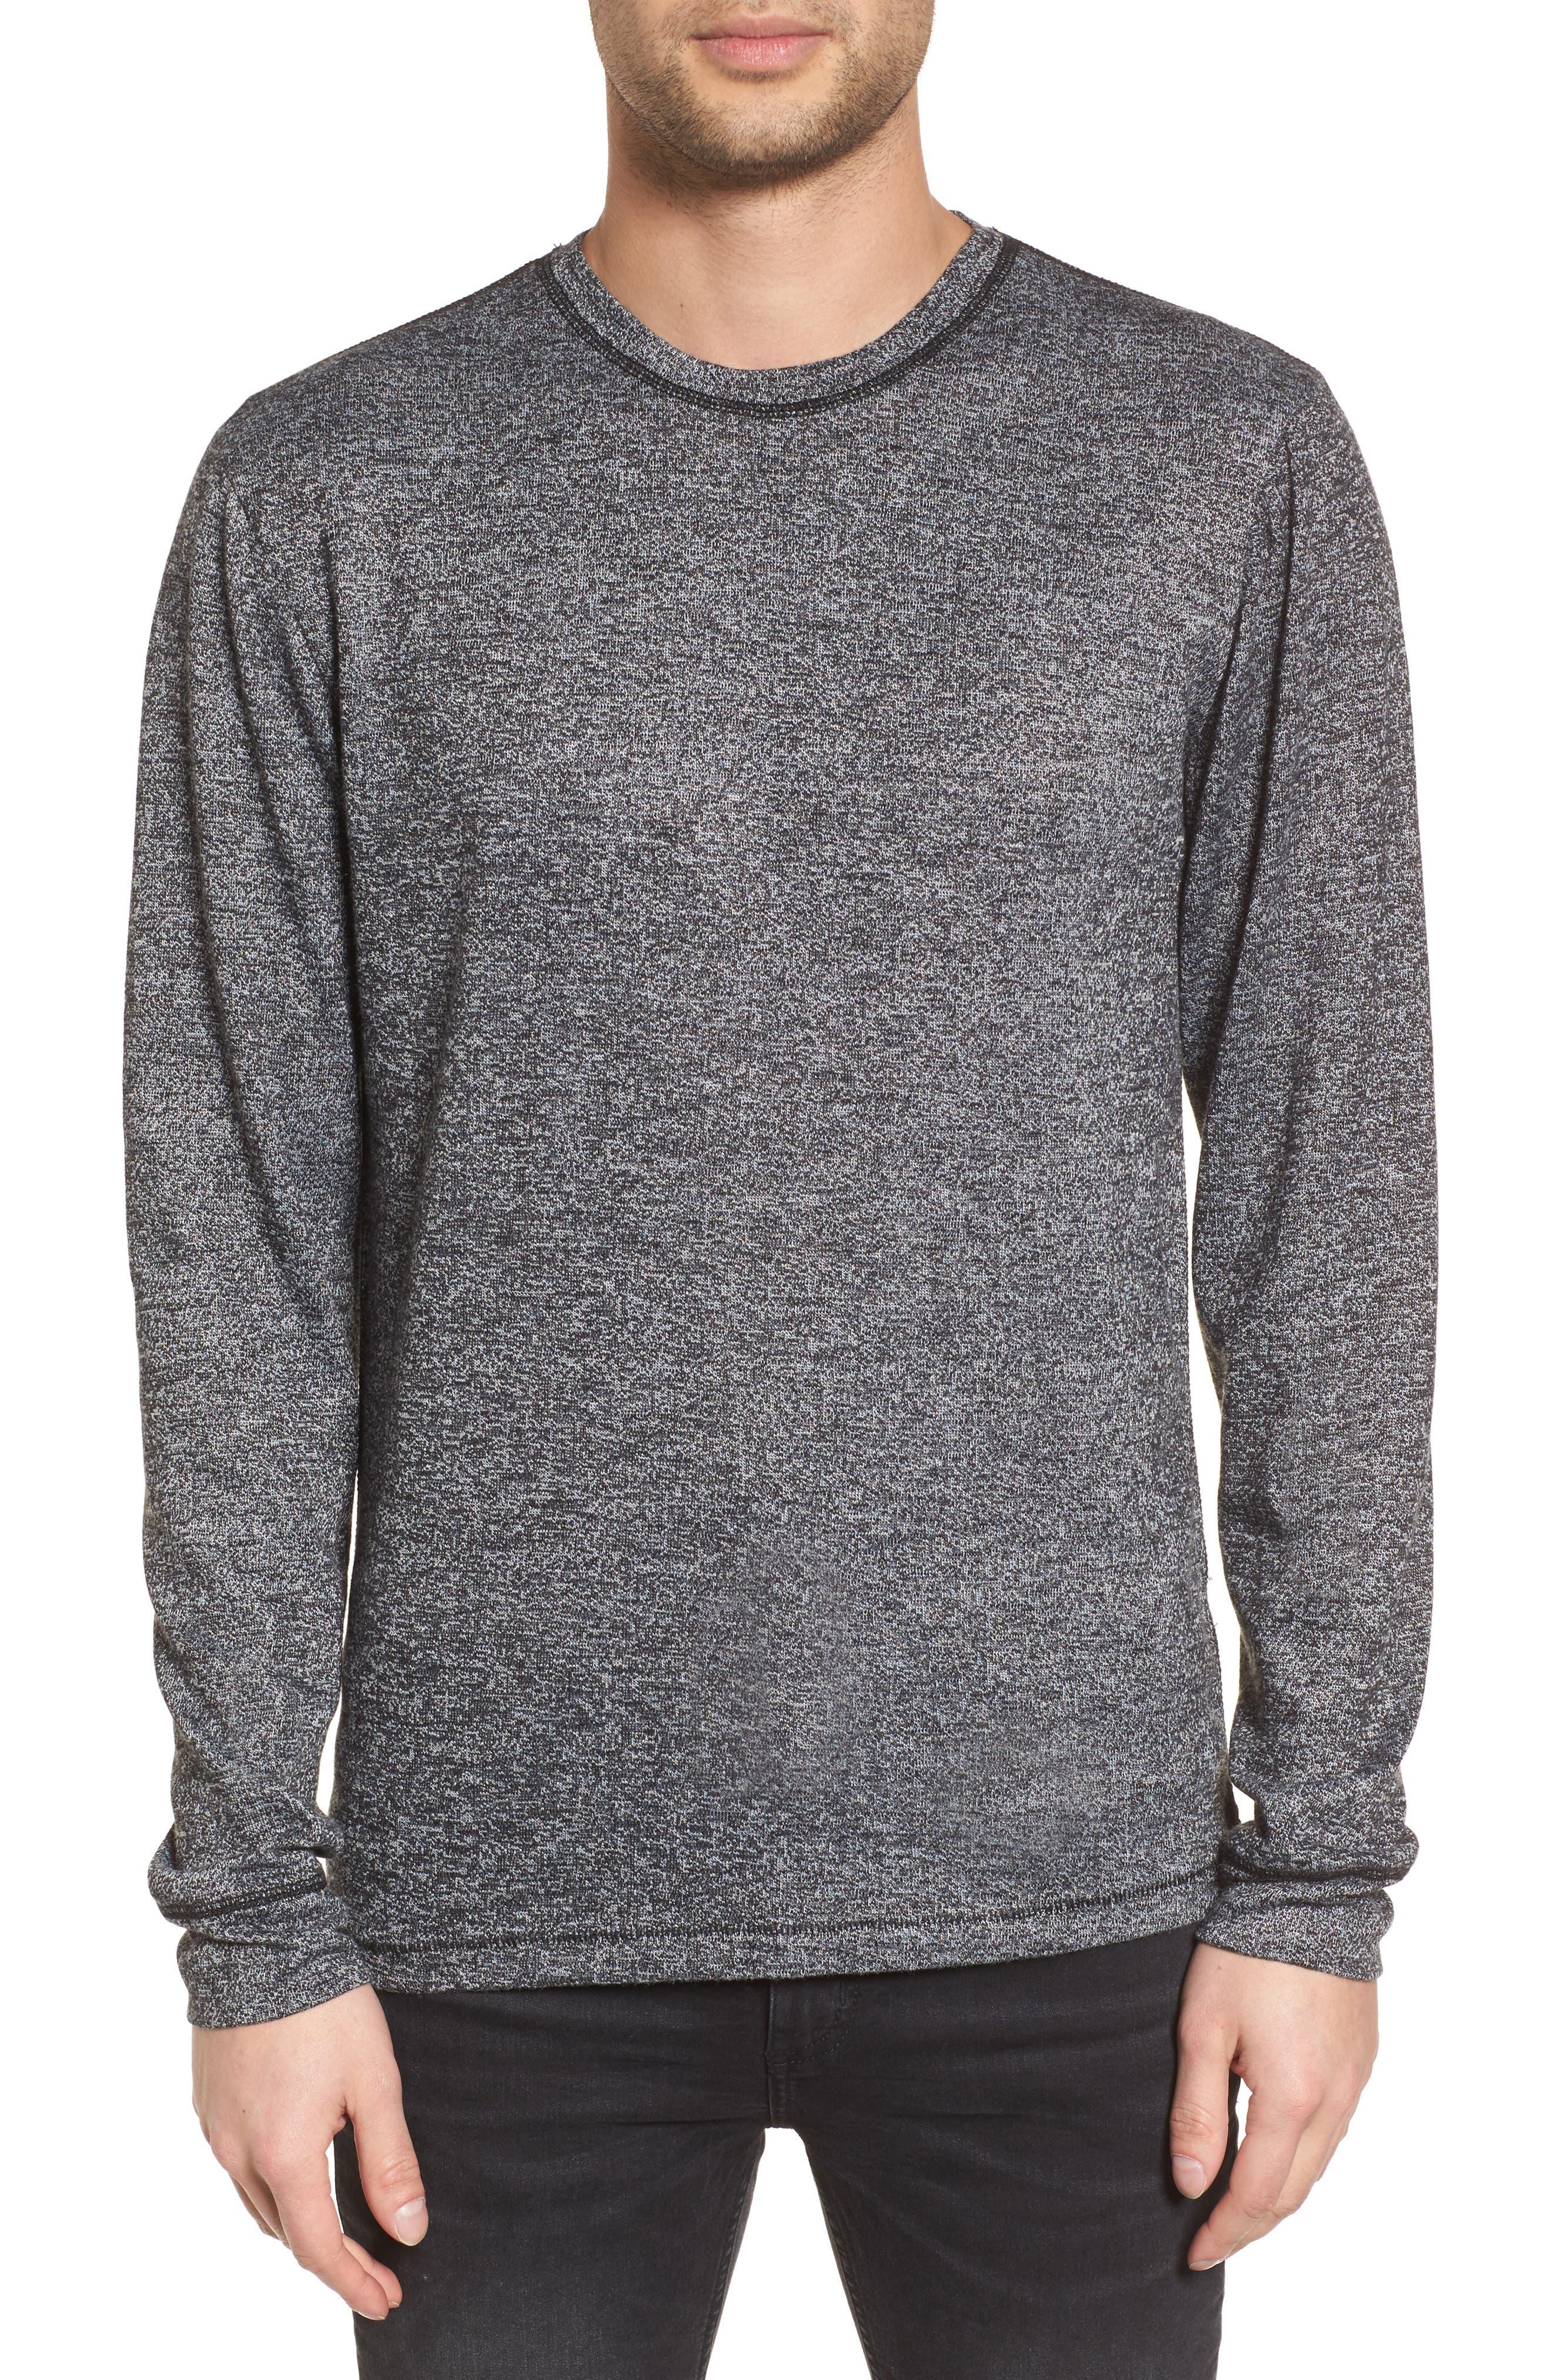 Treasure&Bond Crewneck Sweater,                         Main,                         color, 001